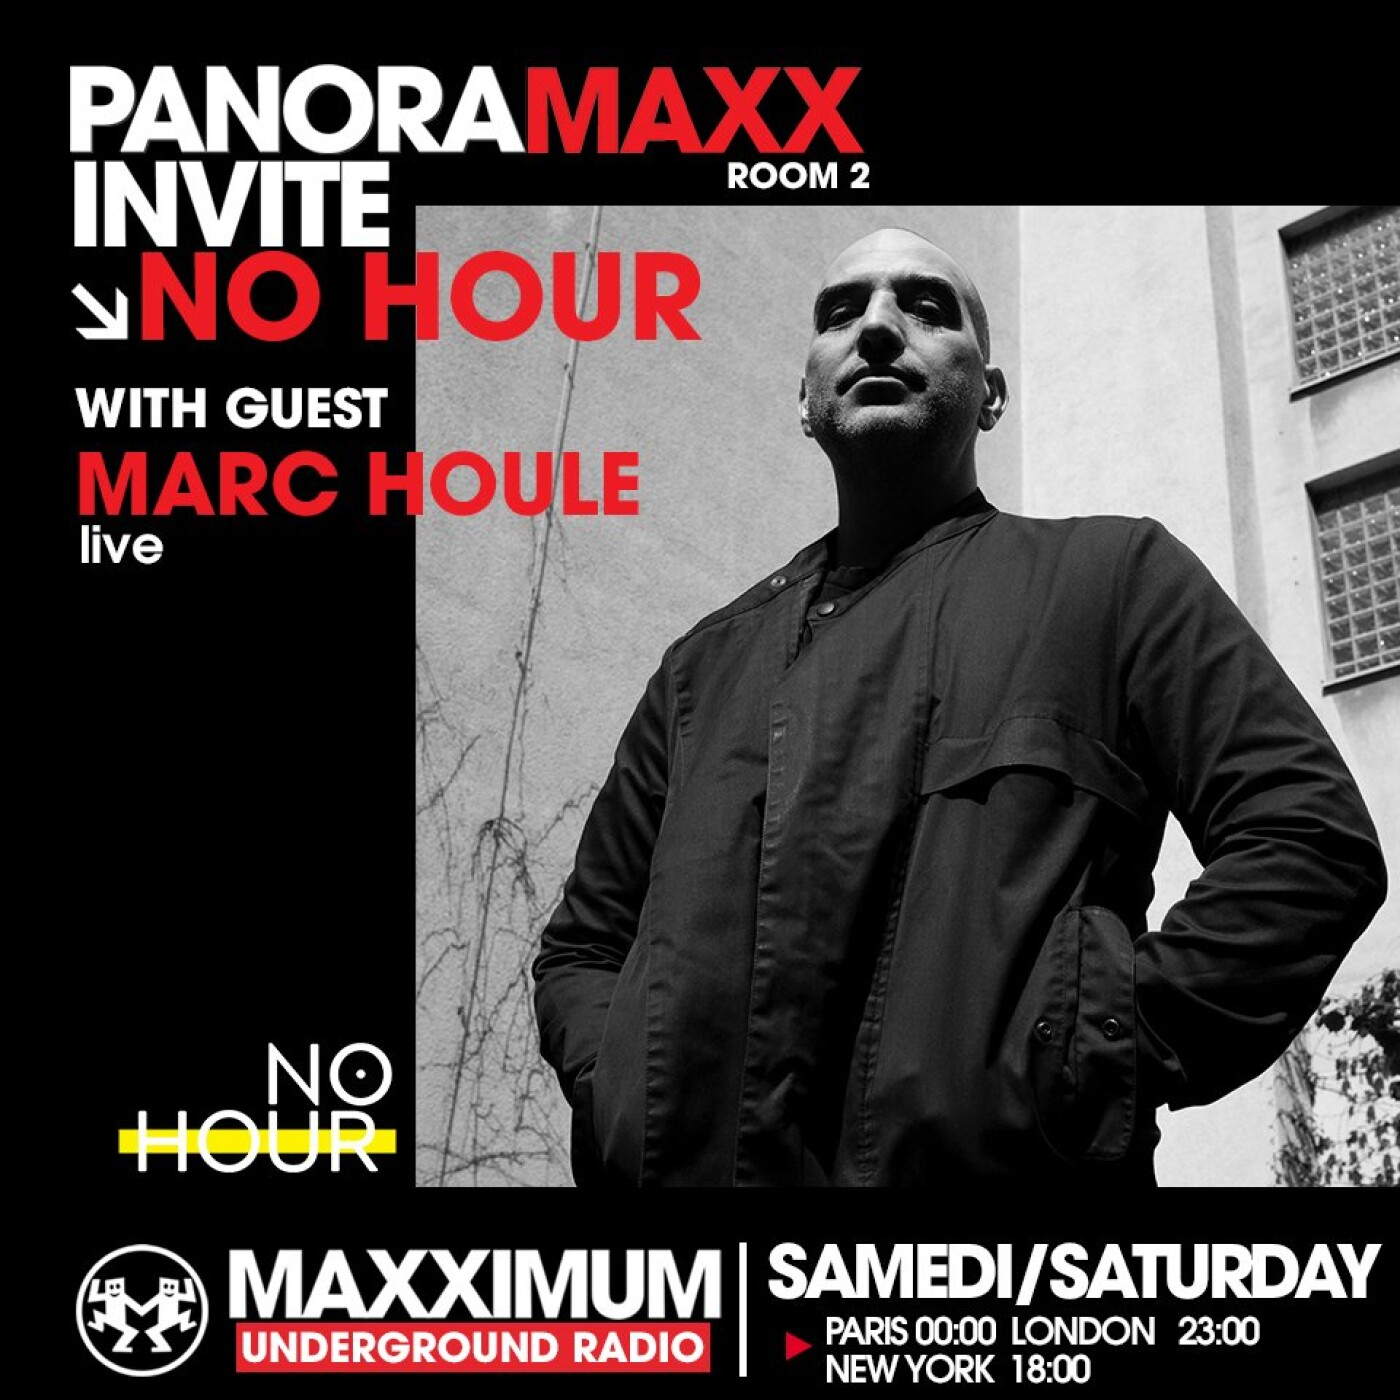 PANORAMAXX : MARC HOULE